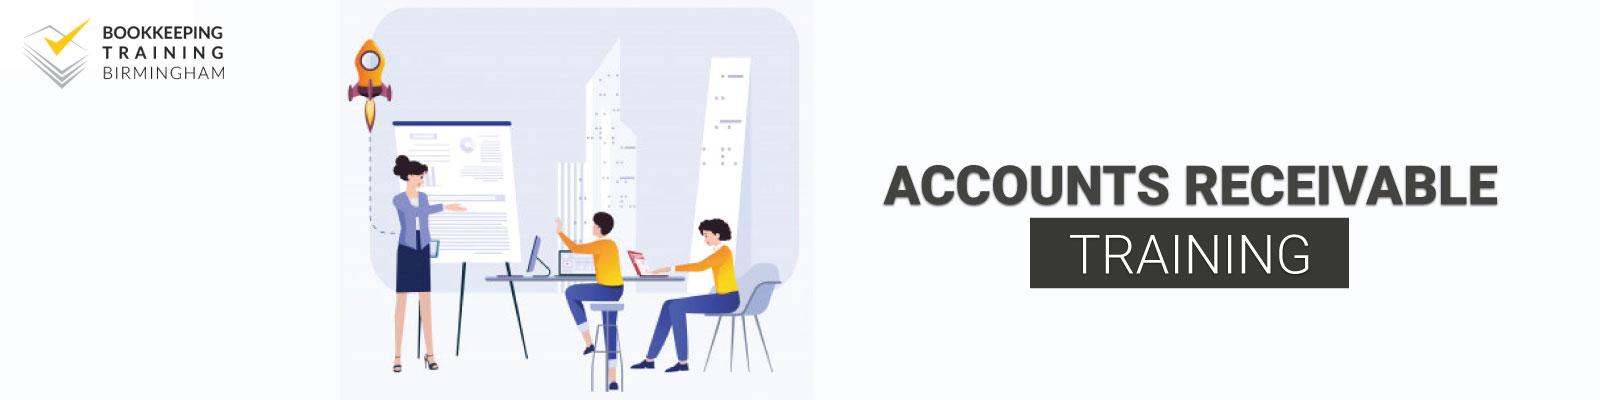 accounts-receivable-training